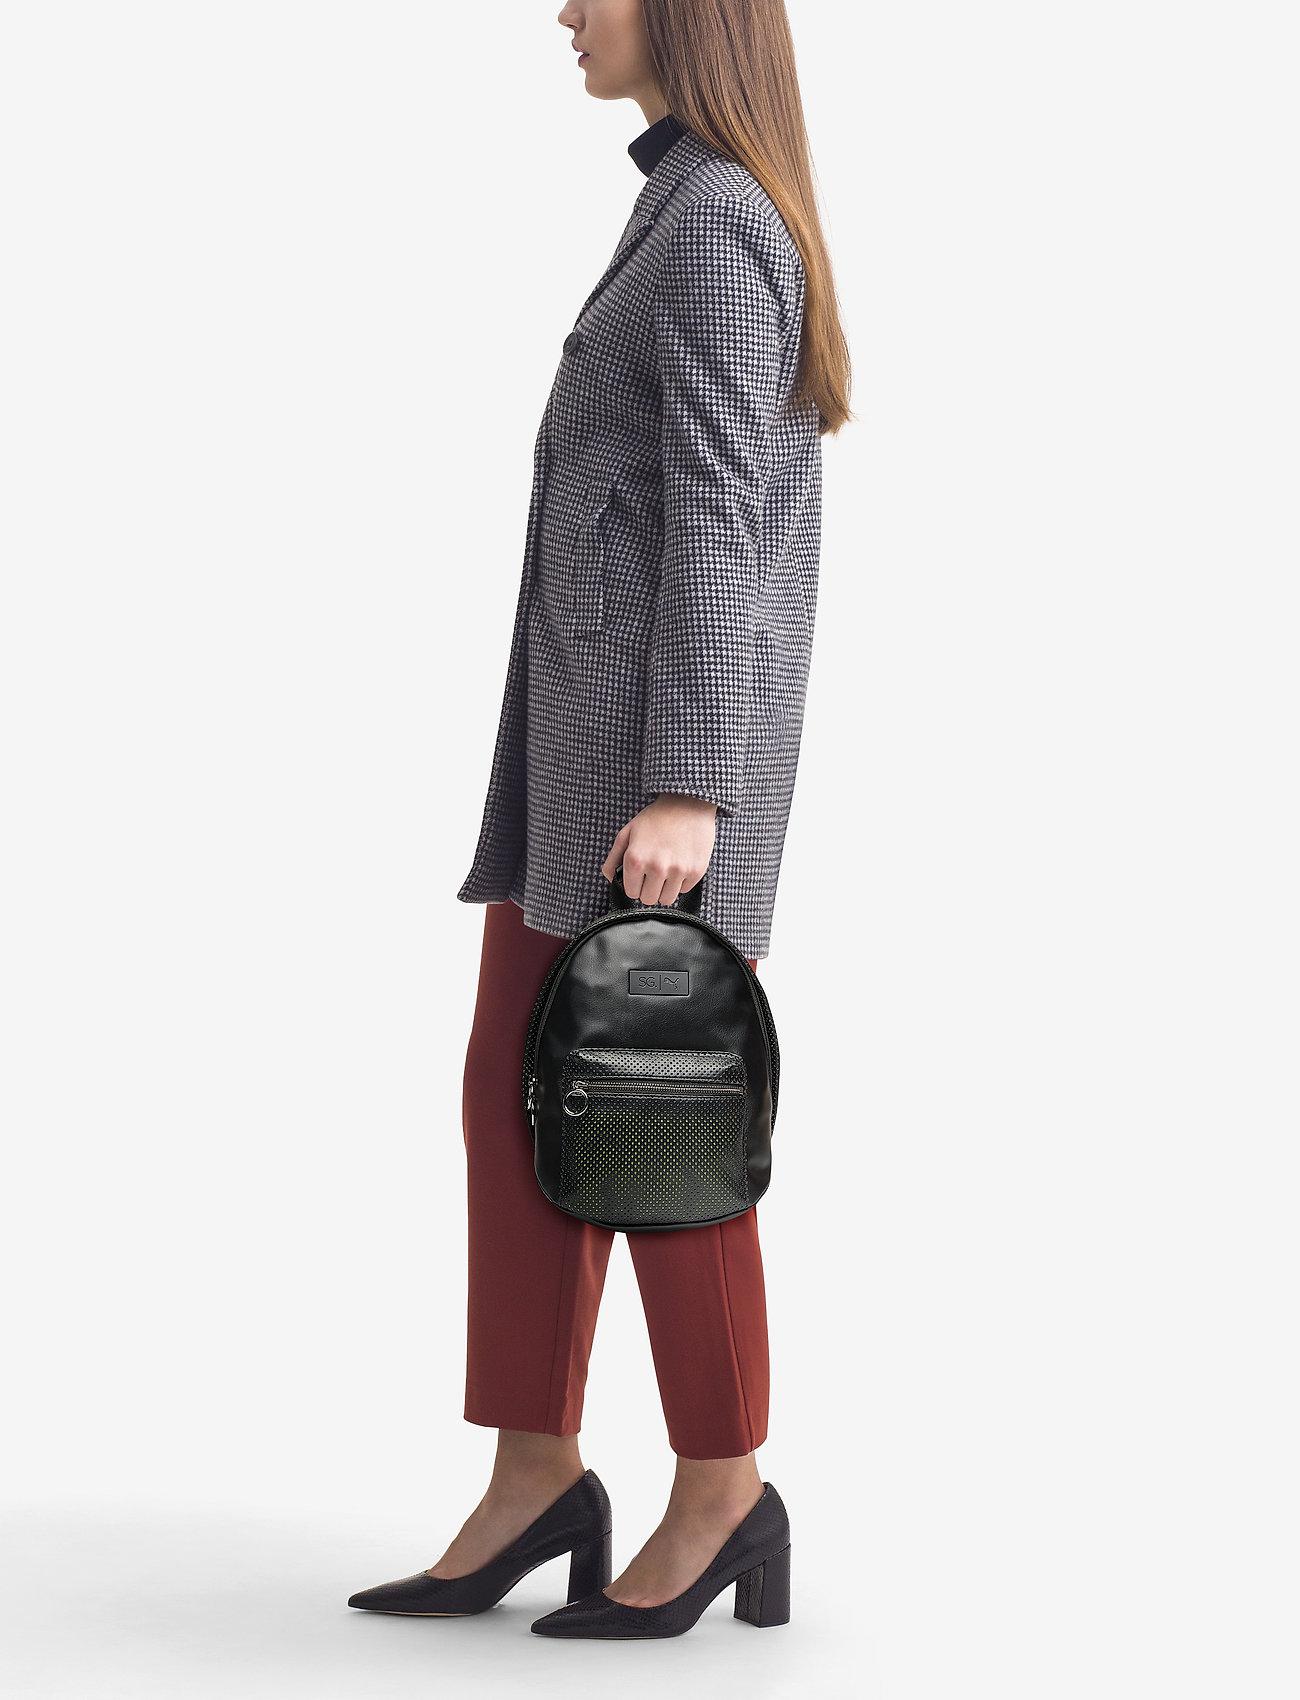 PUMA PUMA x SG Style Backpack - PUMA BLACK